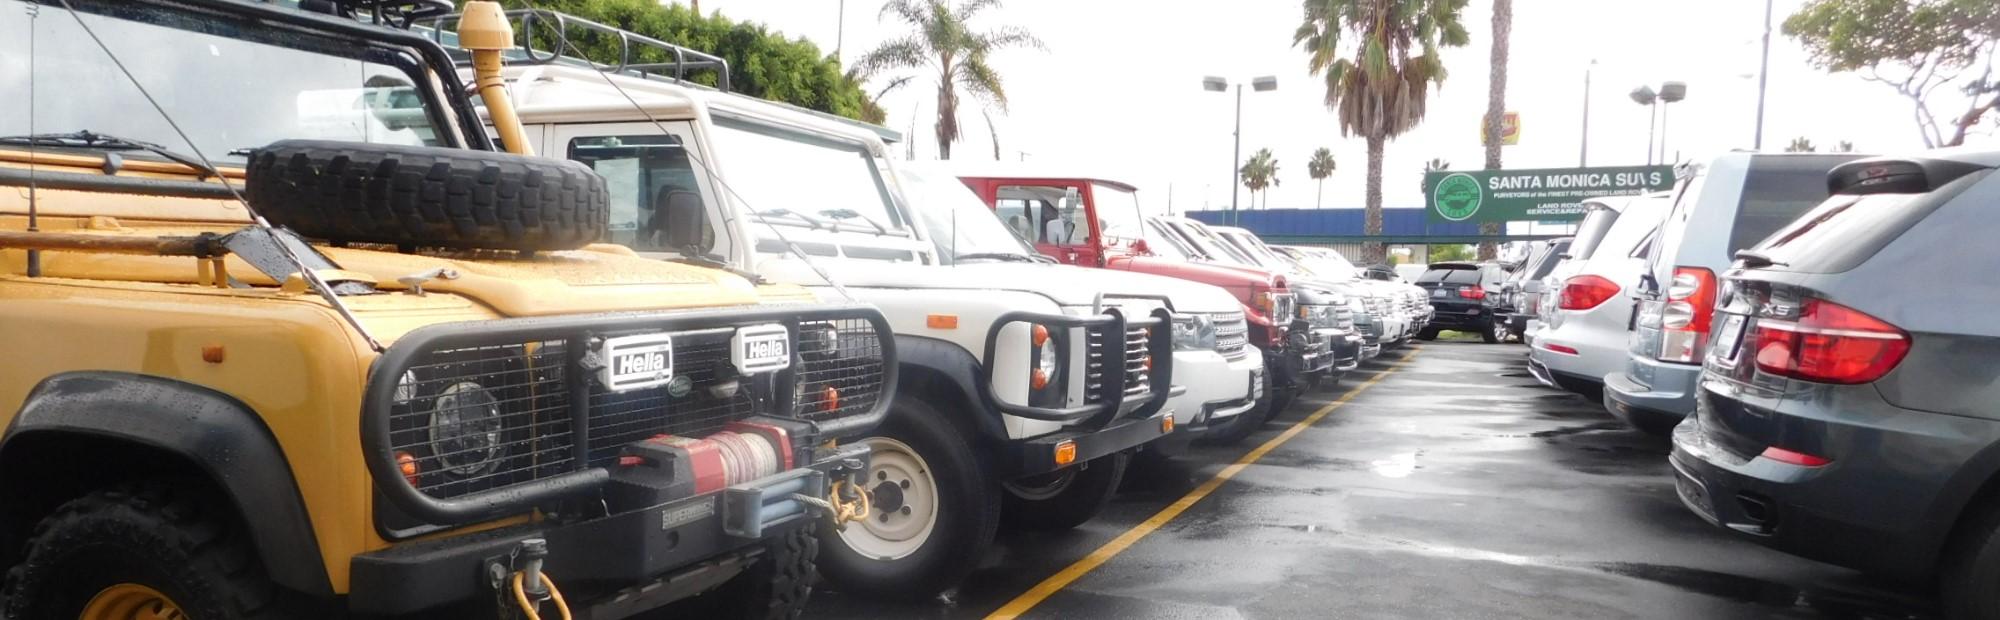 Santa monica suvs auto dealership in santa monica for Mercedes benz service santa monica